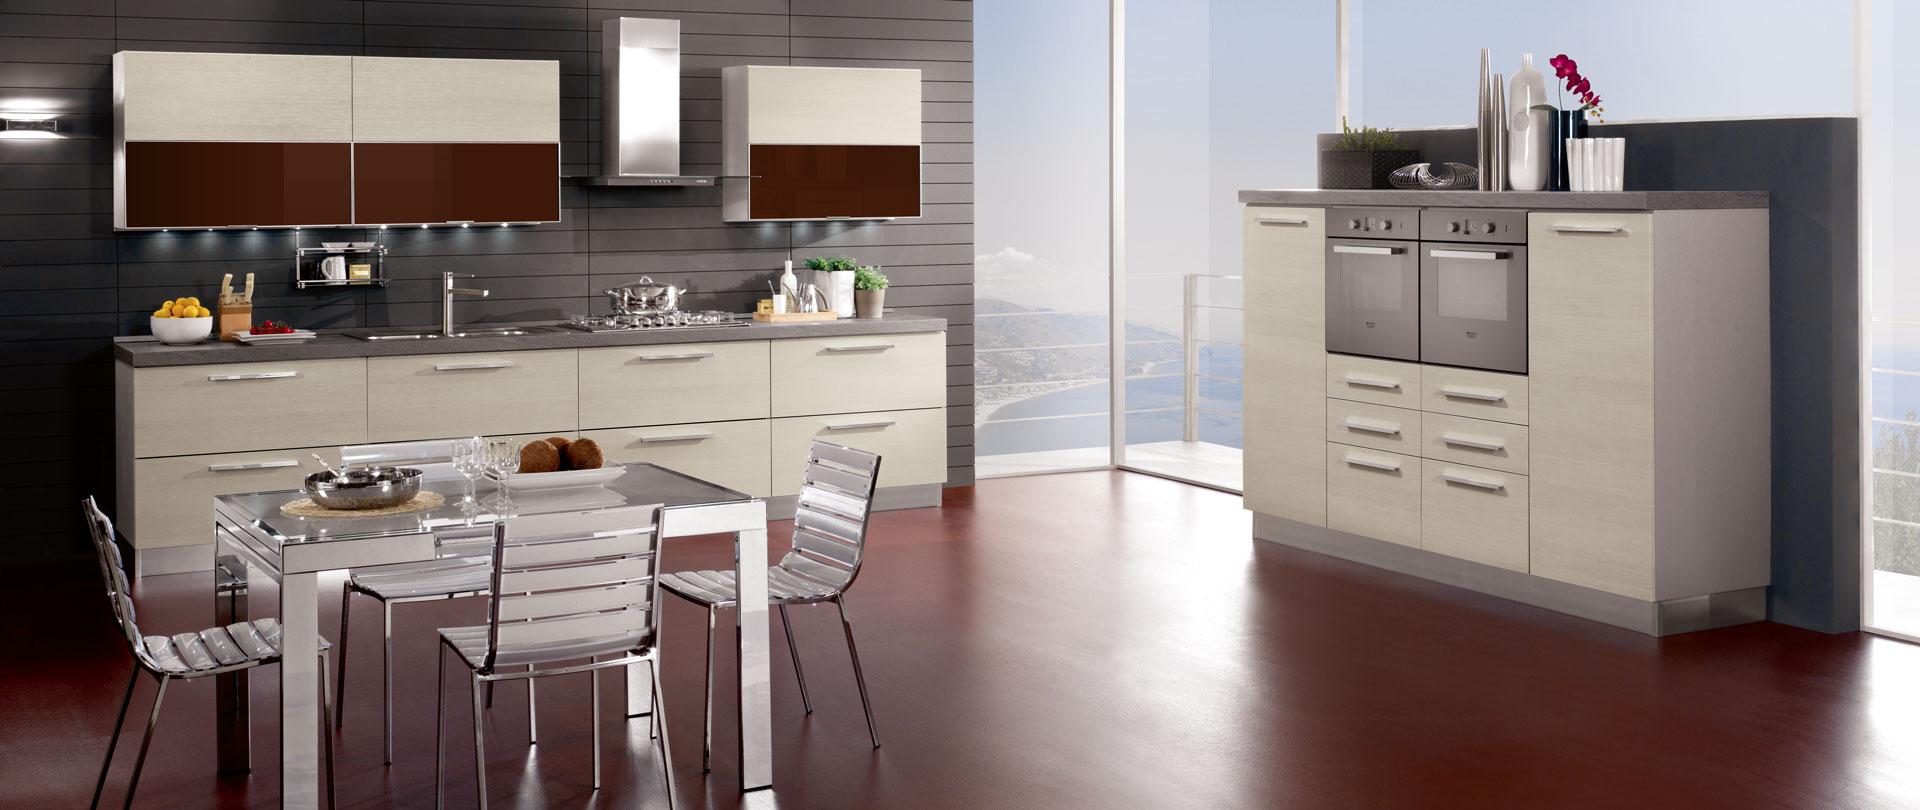 Brio cucinissima for Cucina moderna 2018 pdf